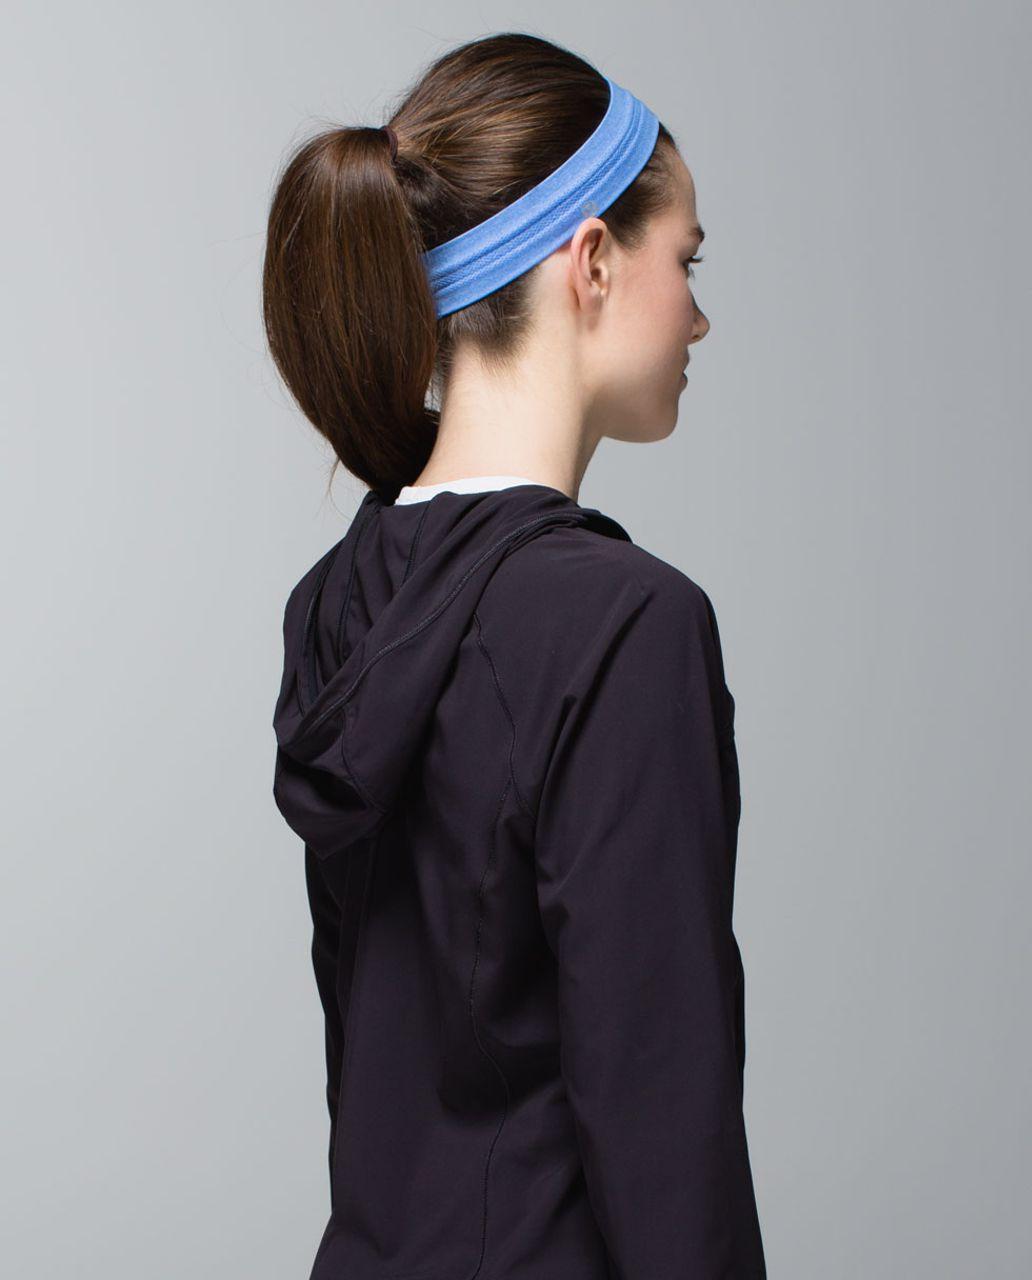 Lululemon Swiftly Headband - Heathered Pipe Dream Blue